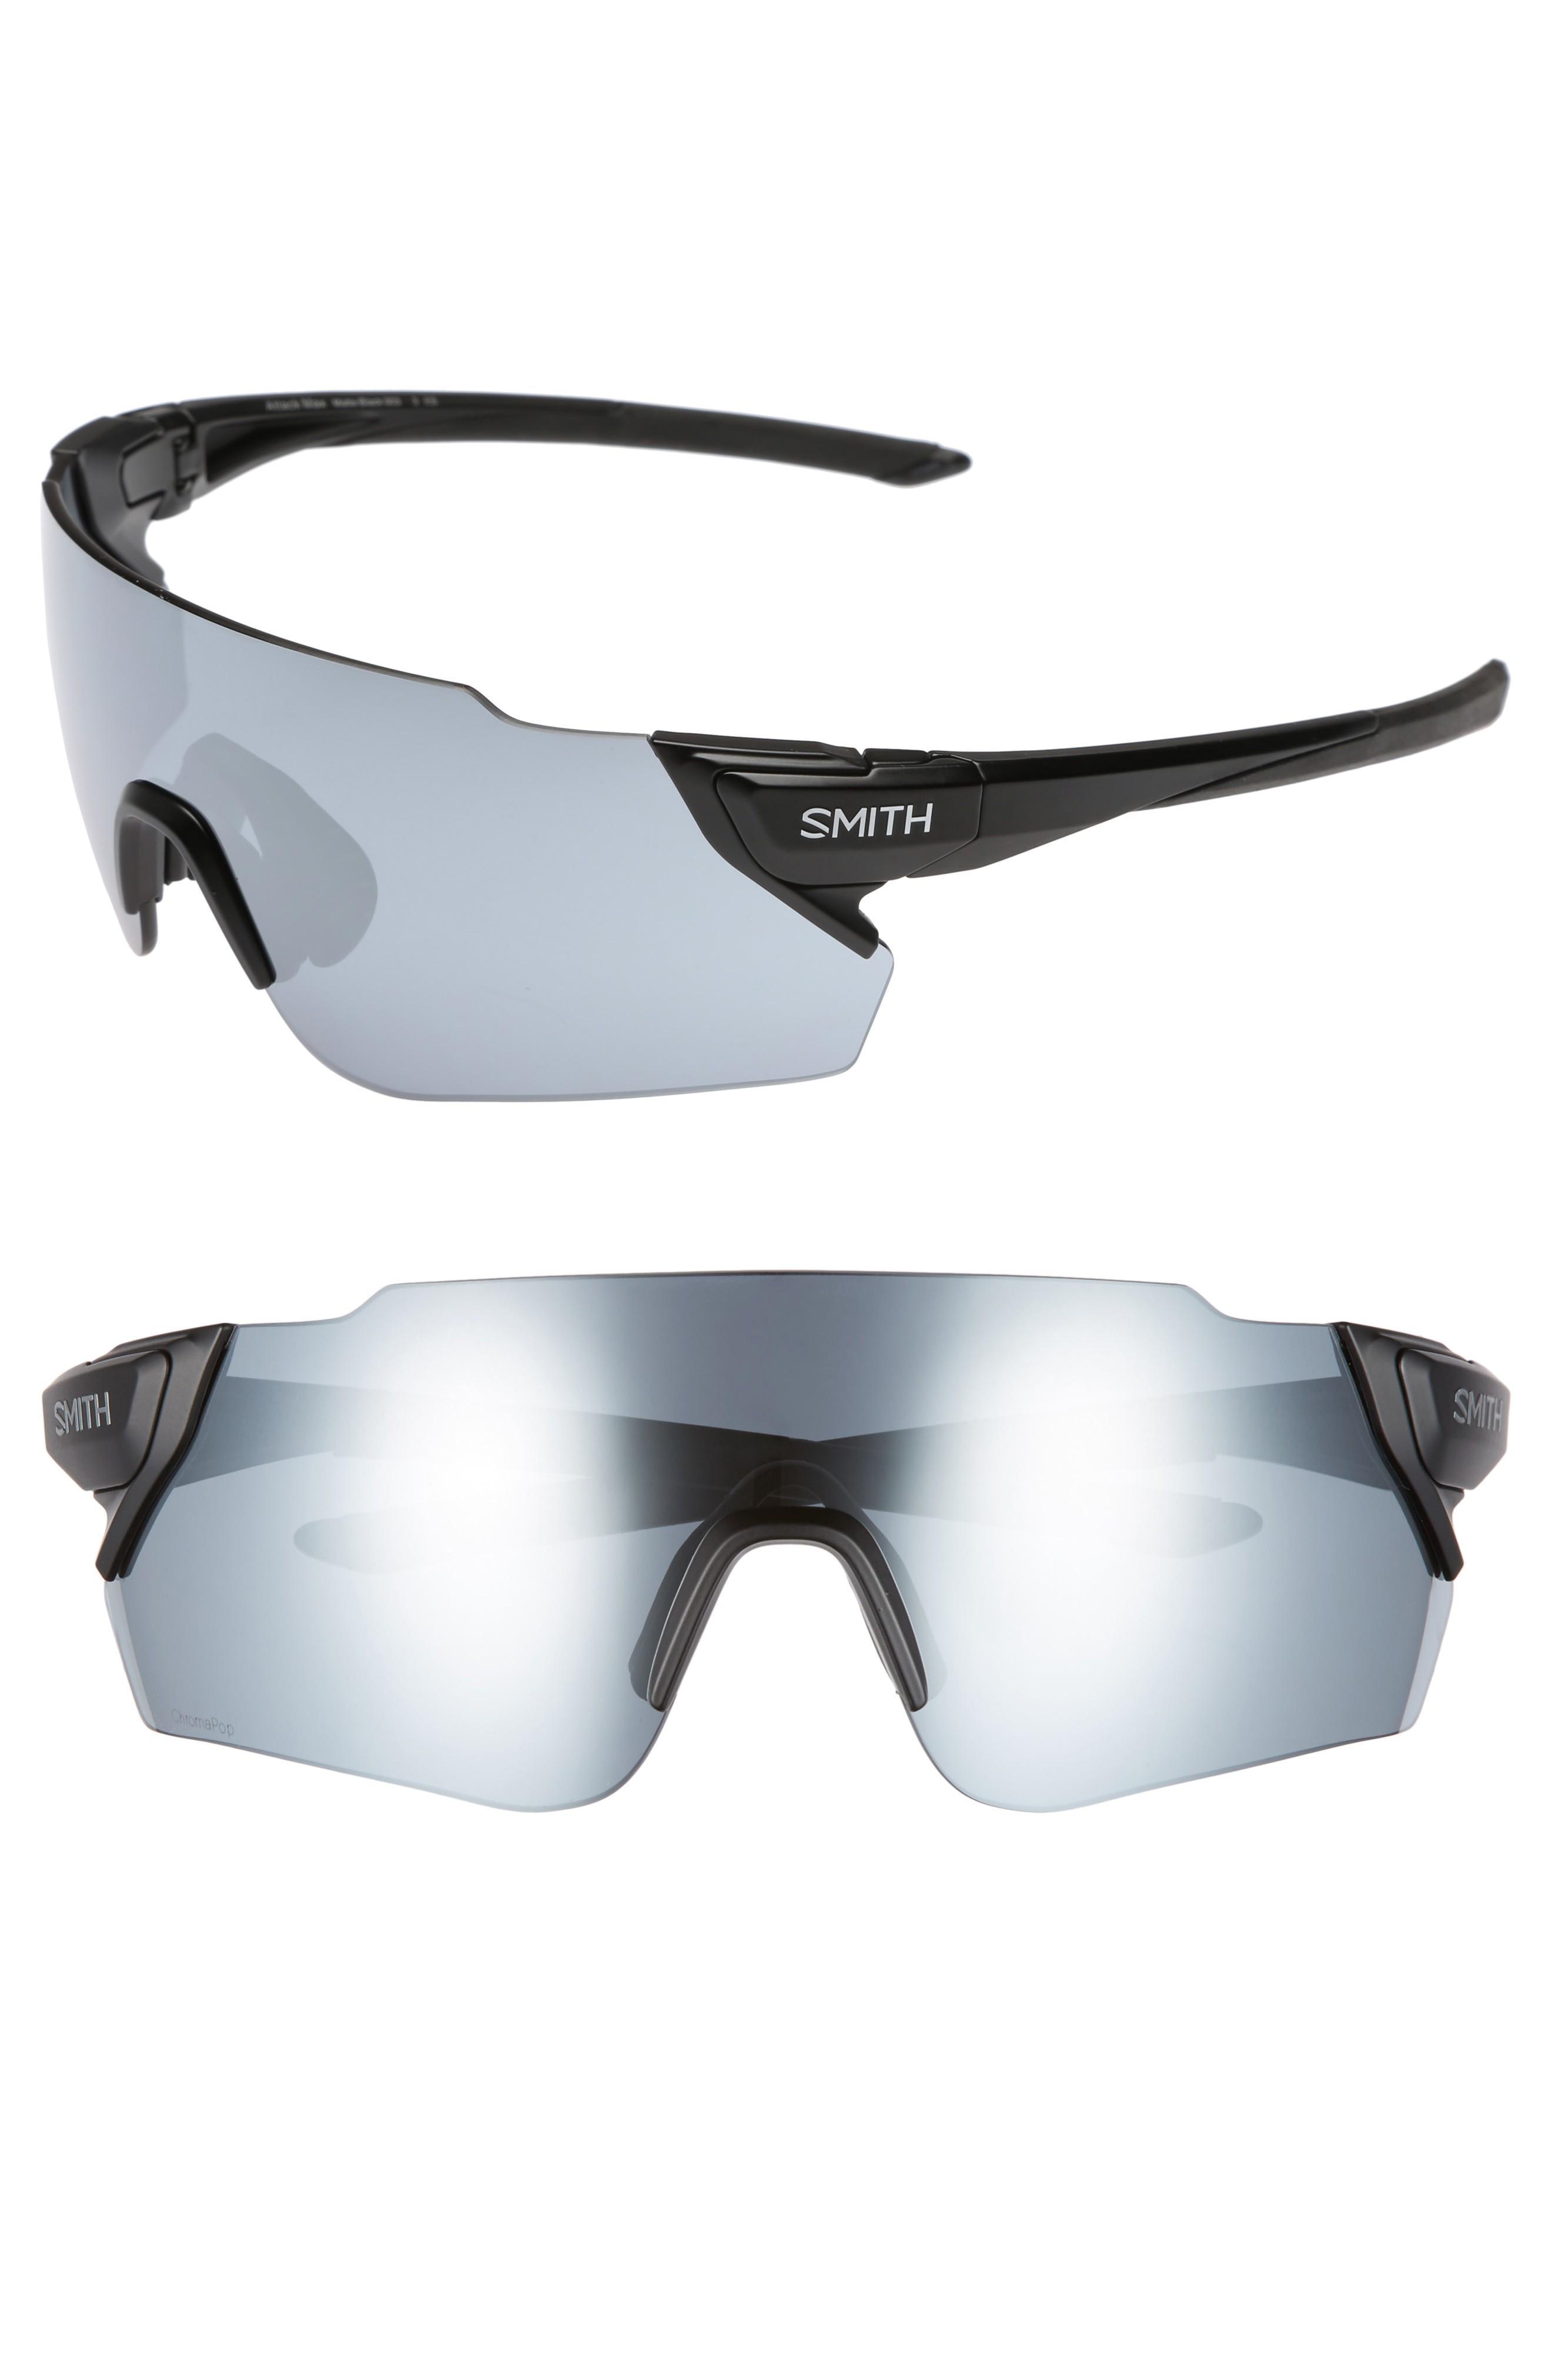 6d6e8b0fdac Smith Attack Max 125Mm Chromapop(Tm) Polarized Shield Sunglasses - Matte  Black  Platinum